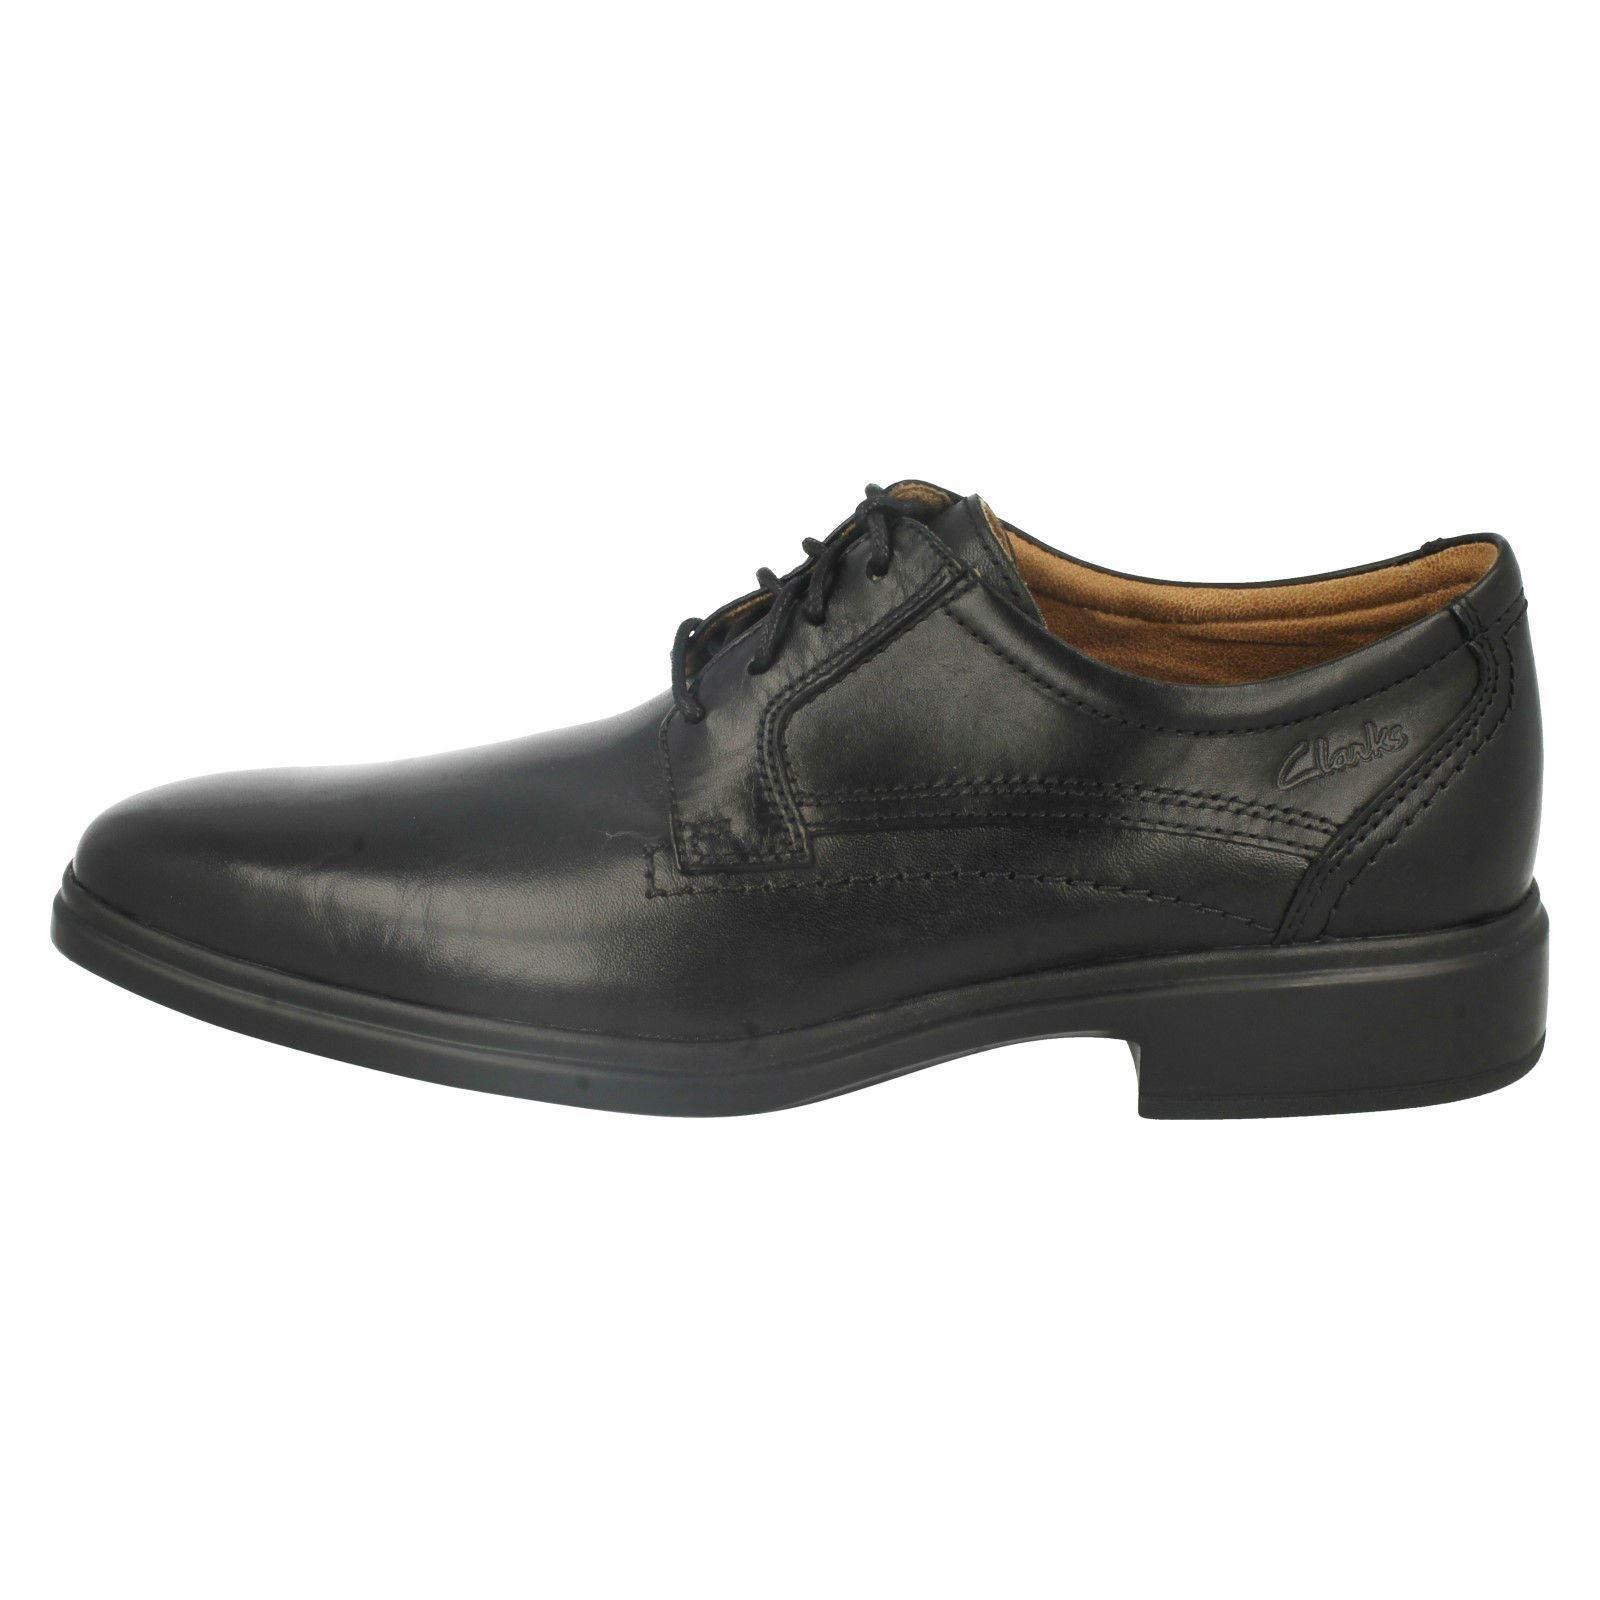 Para Hombre Zapatos Clarks Zapatos Hombre Con Cordones Formal Glevo Caminar 4b4cce